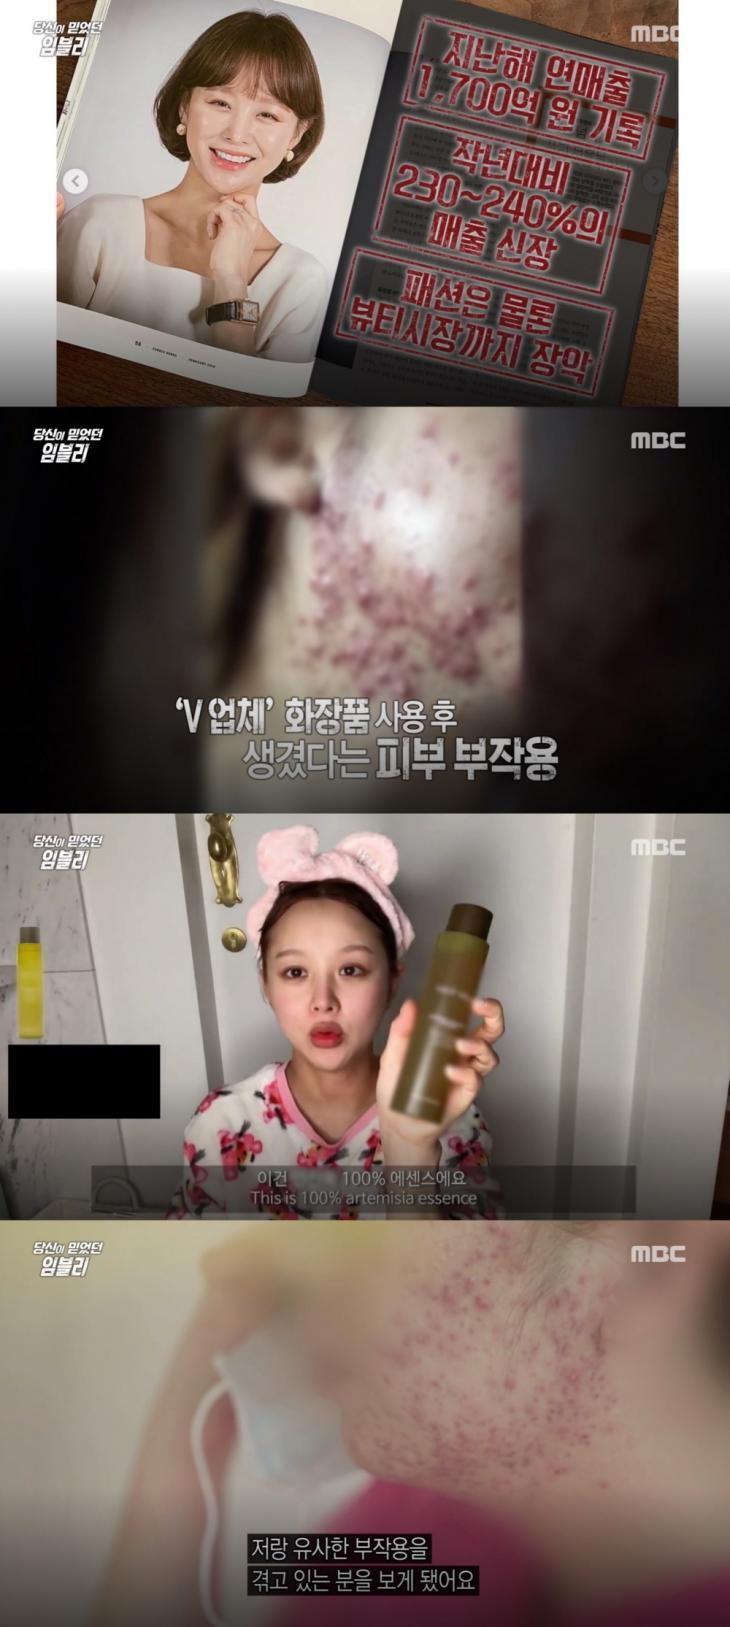 MBC '당신이 믿었던 페이크 시즌2' 방송 캡처